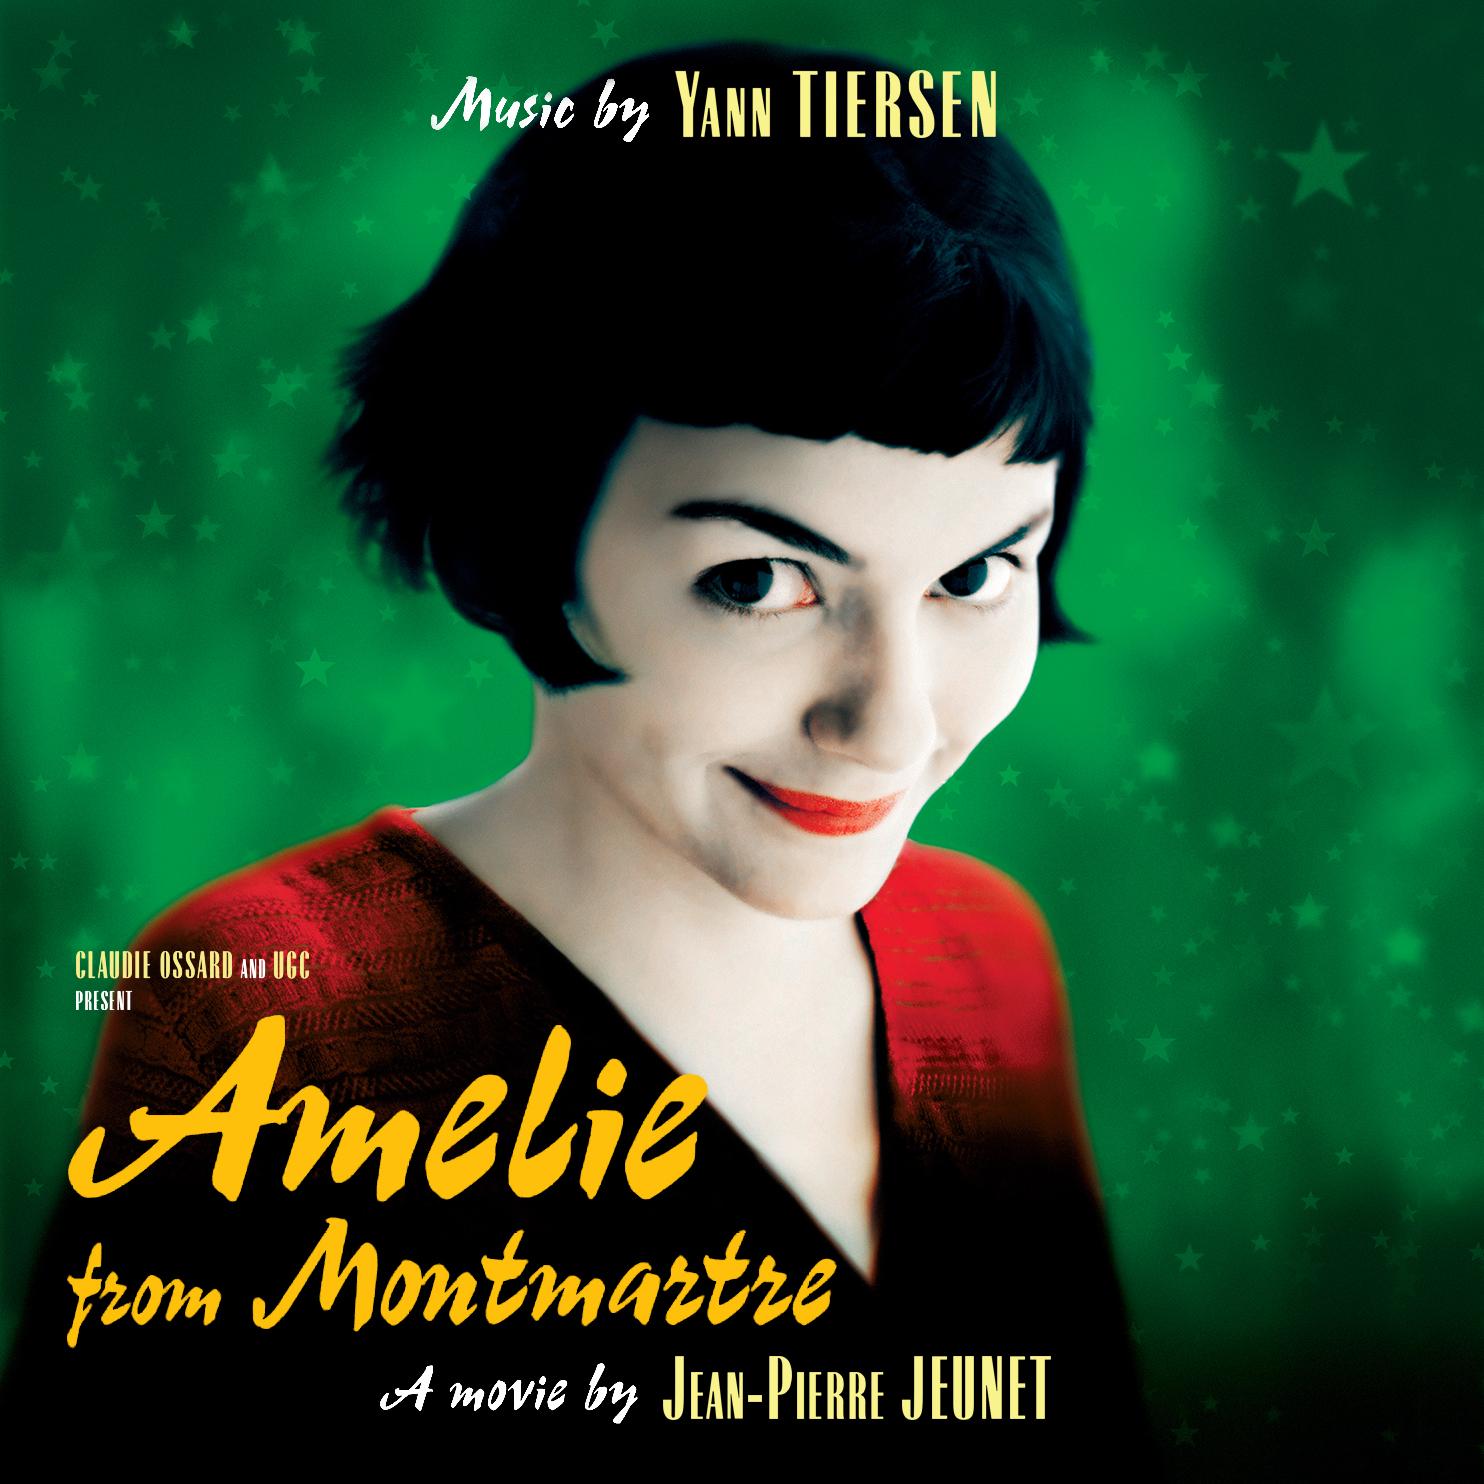 Album Artist: Yann Tiersen / Album Title: Amelie from Montmartre